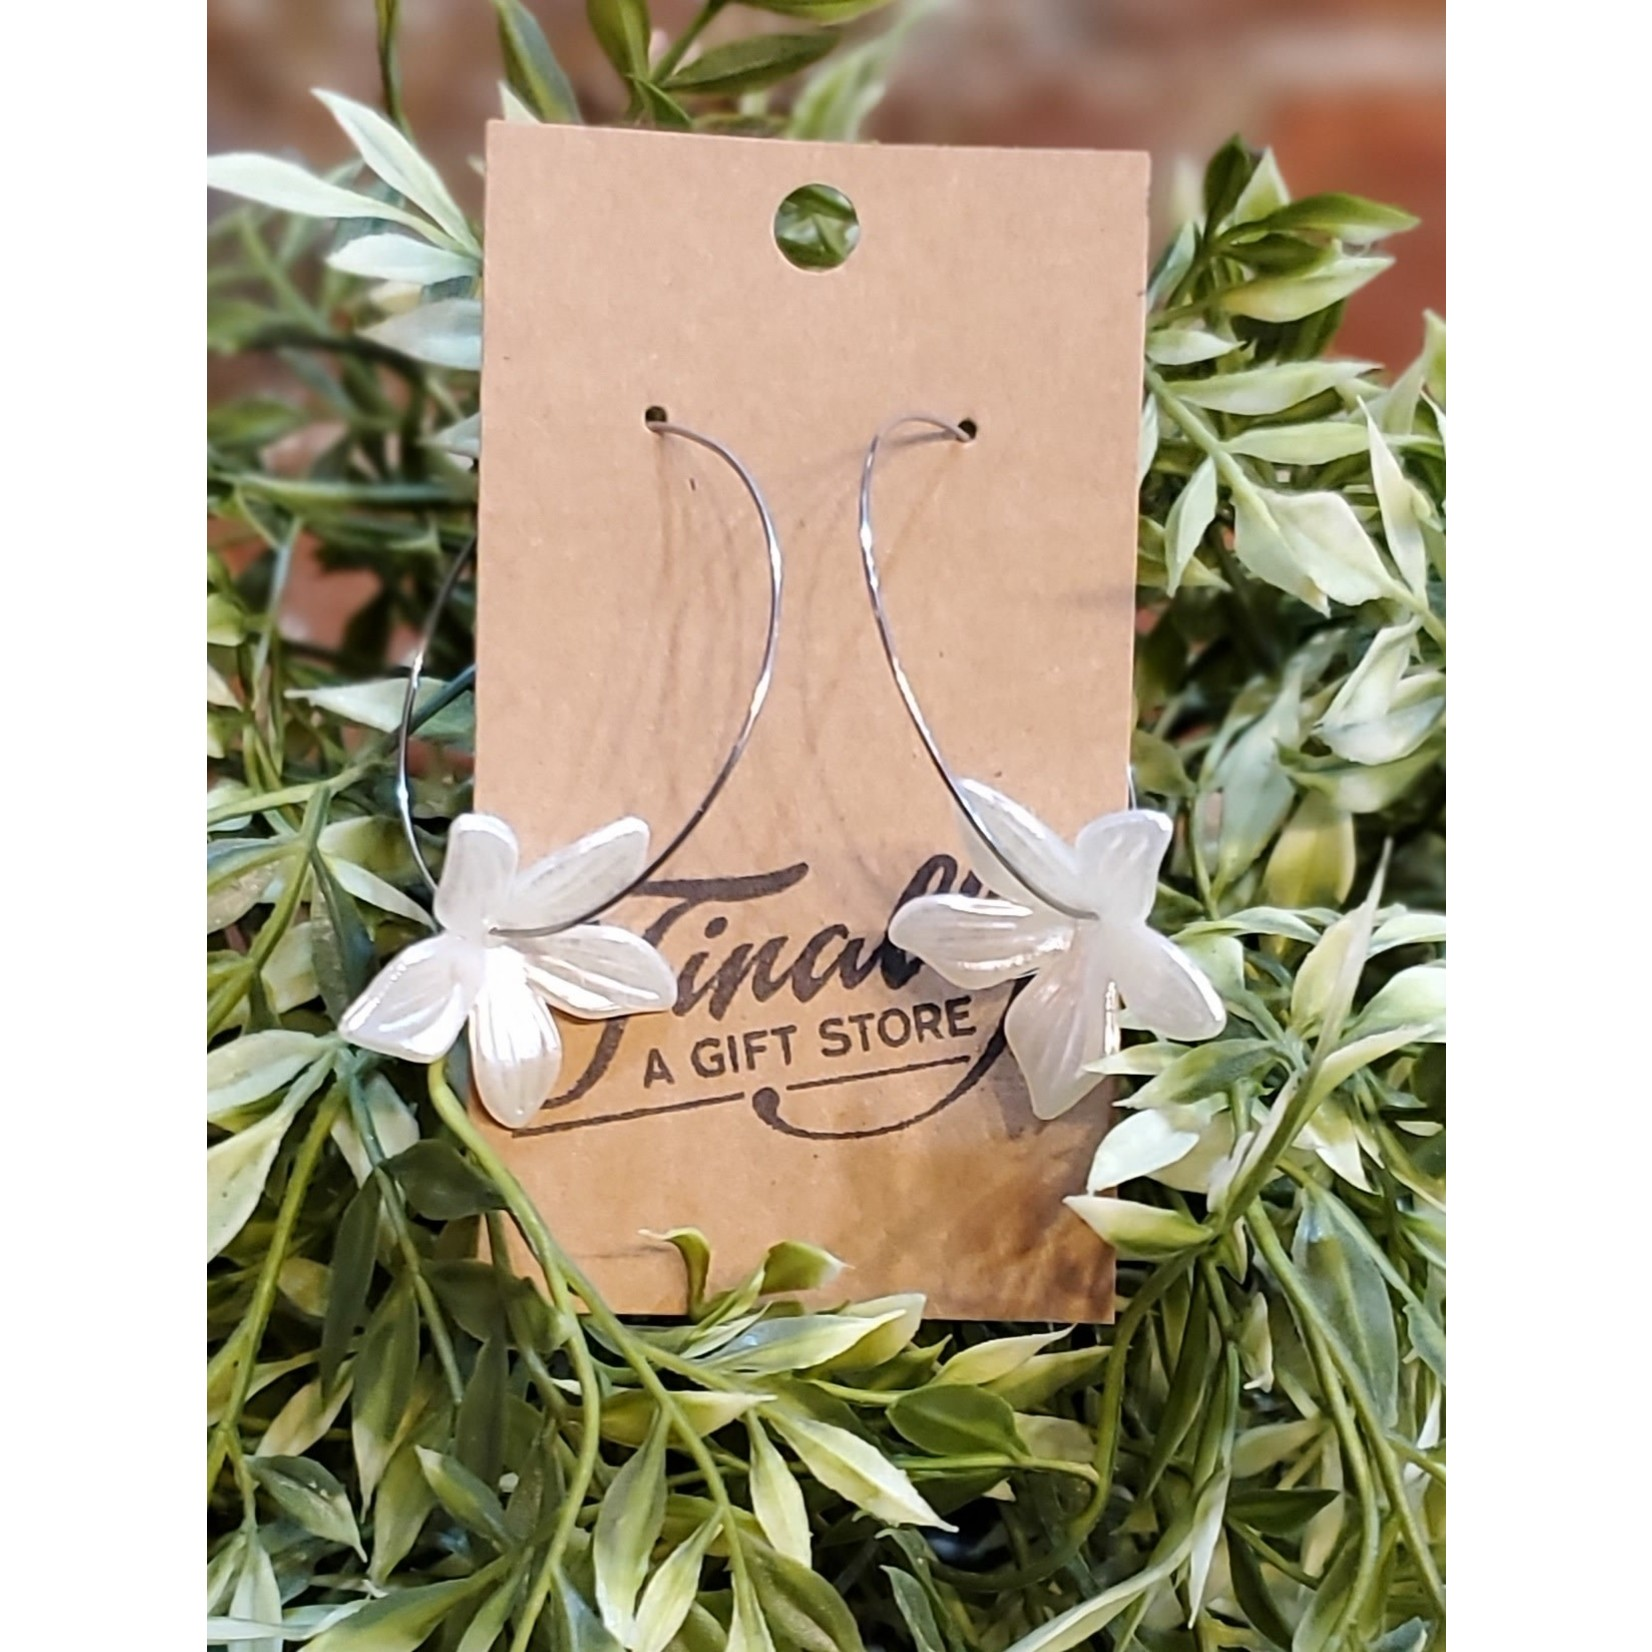 Baubles by B Earrings: Silver Blossom Hoop